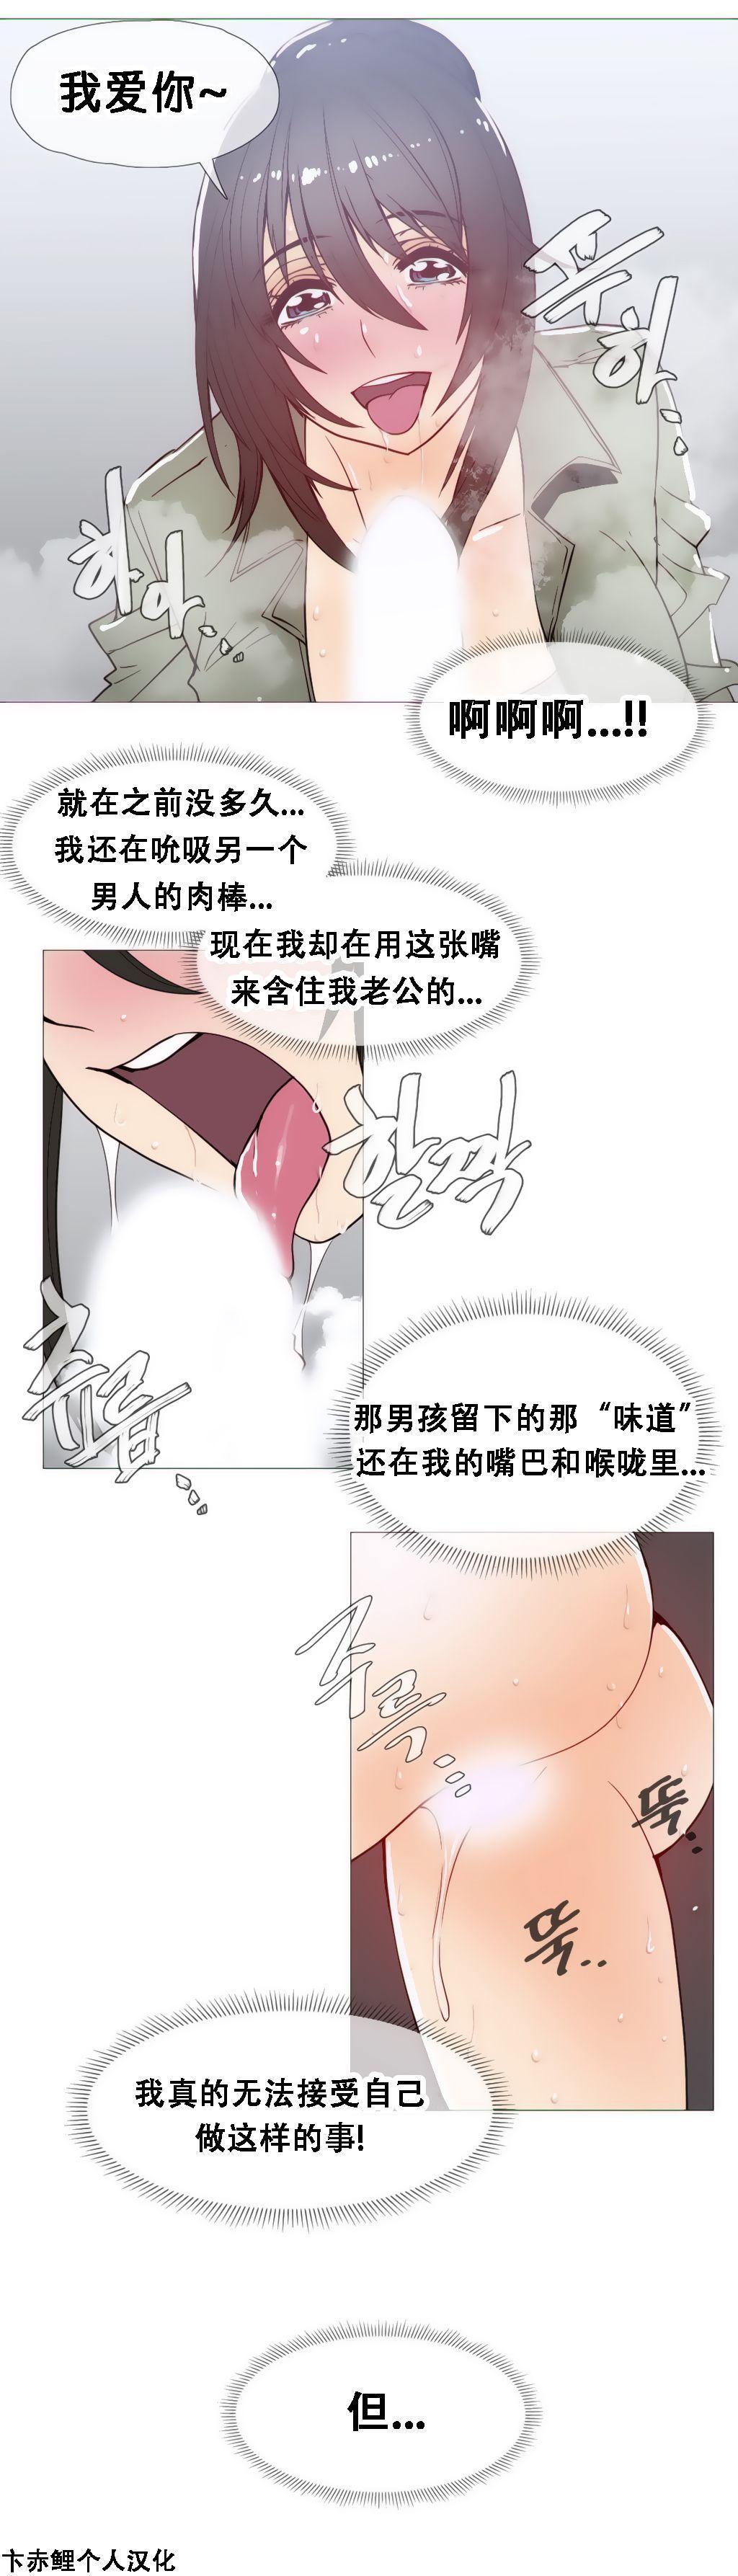 HouseHold Affairs 【卞赤鲤个人汉化】1~33话(持续更新中) 514